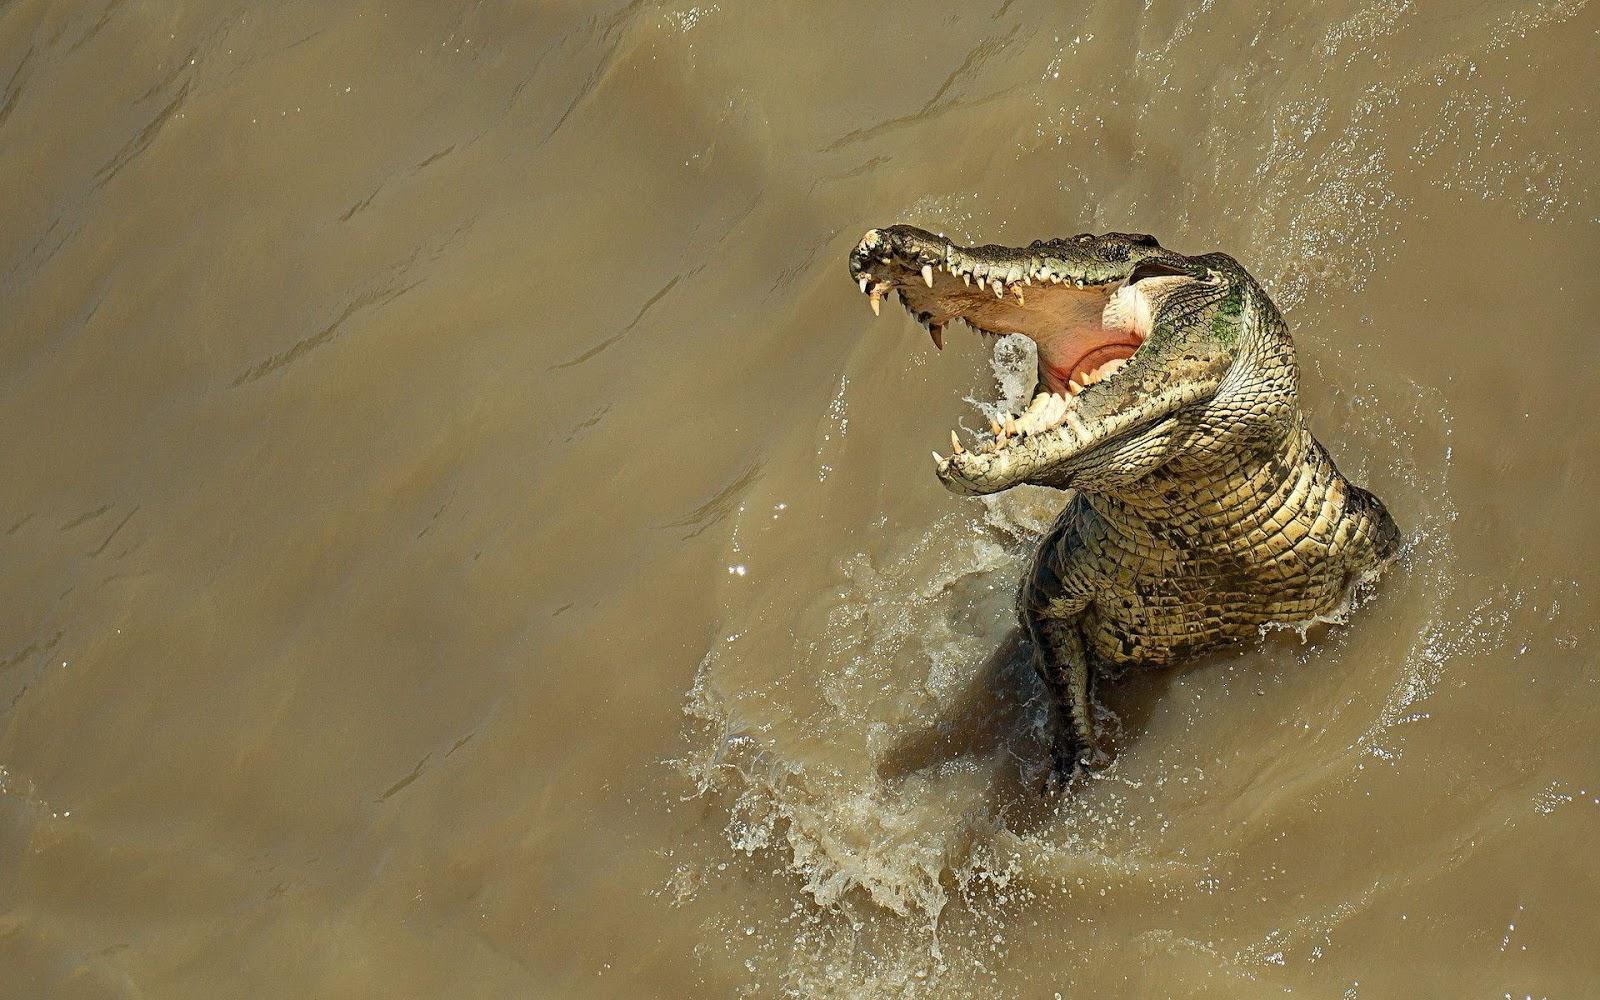 Alligator Computer Wallpapers, Desktop Backgrounds, animal wallpaper